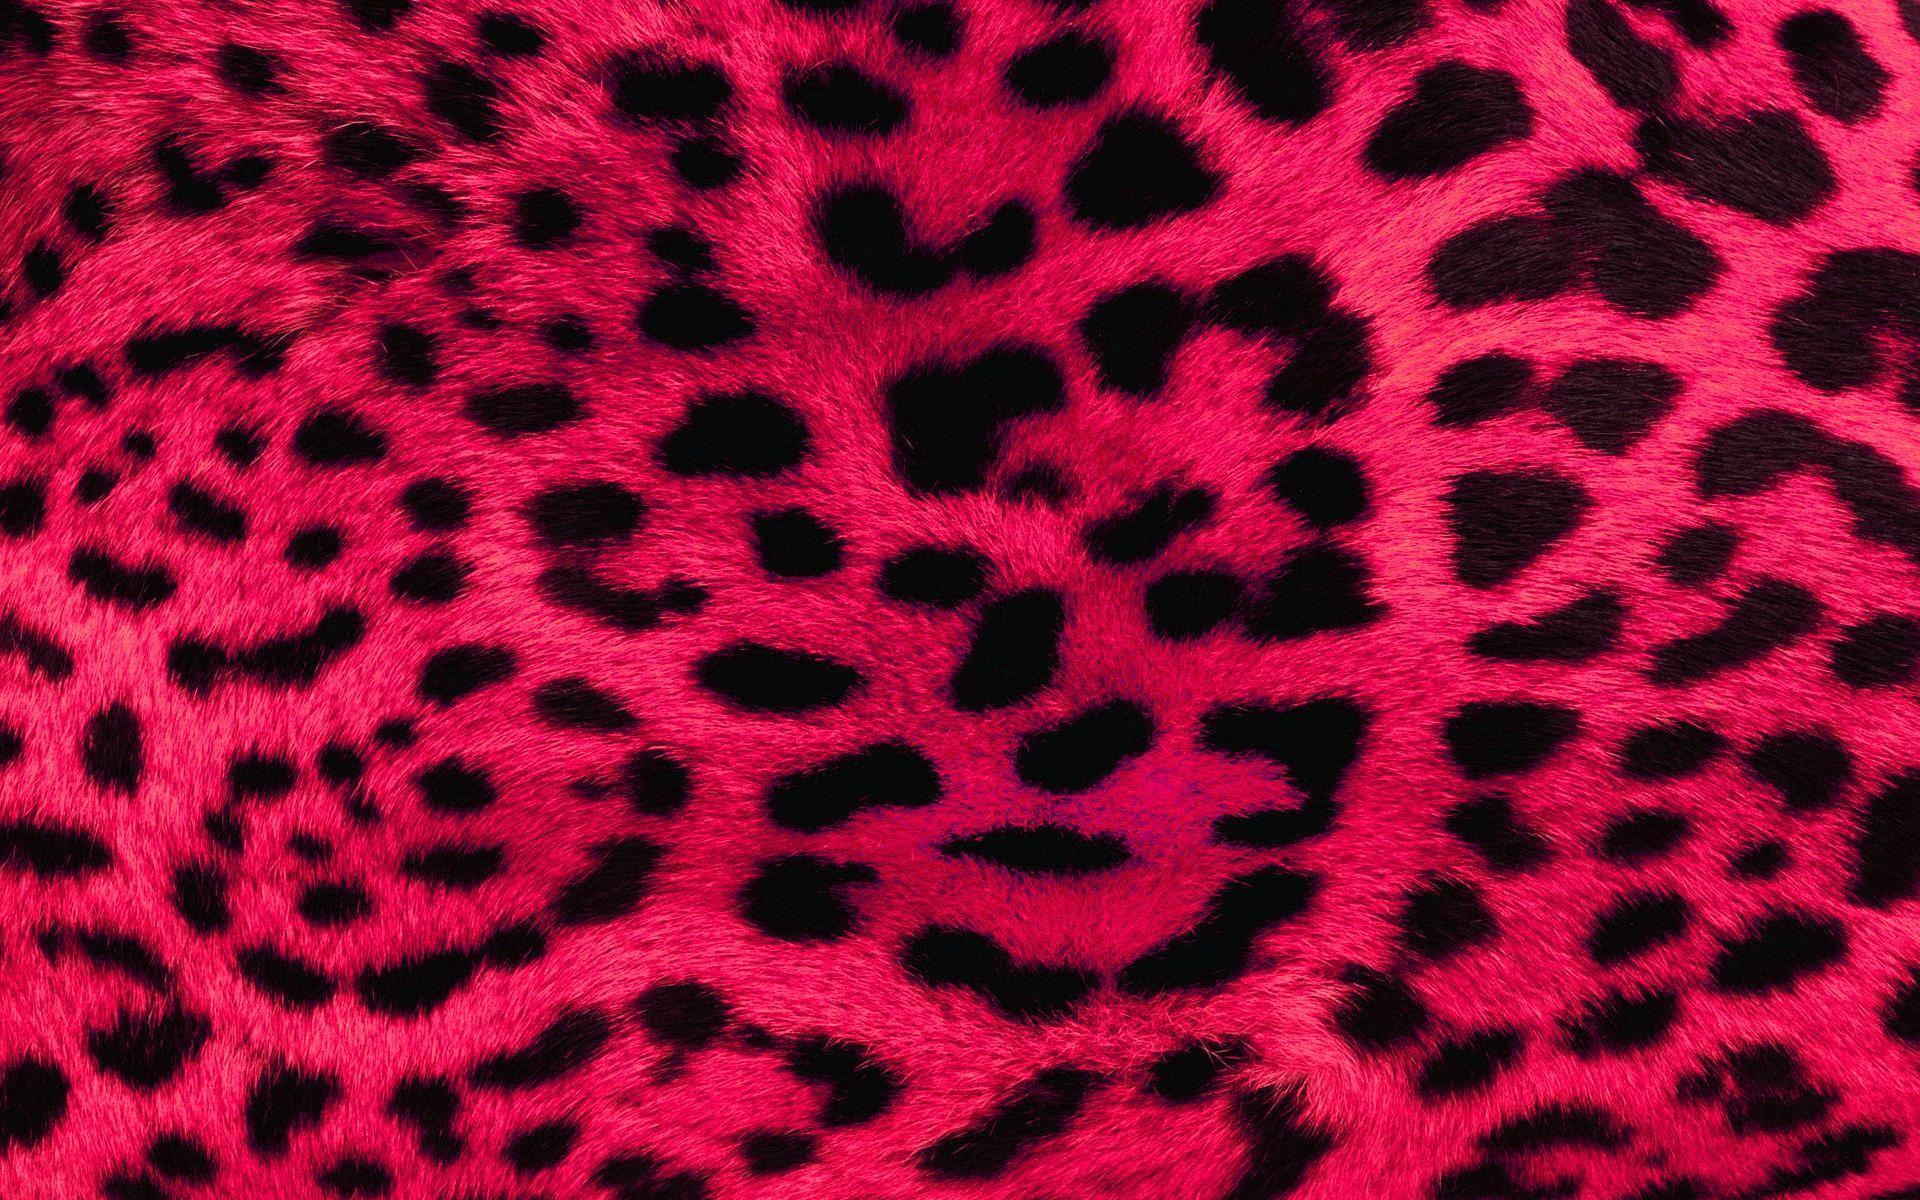 Pink Wallpapers Barbaras HD Wallpapers 1920×1080 Pink Wallpaper Hd (58  Wallpapers)  